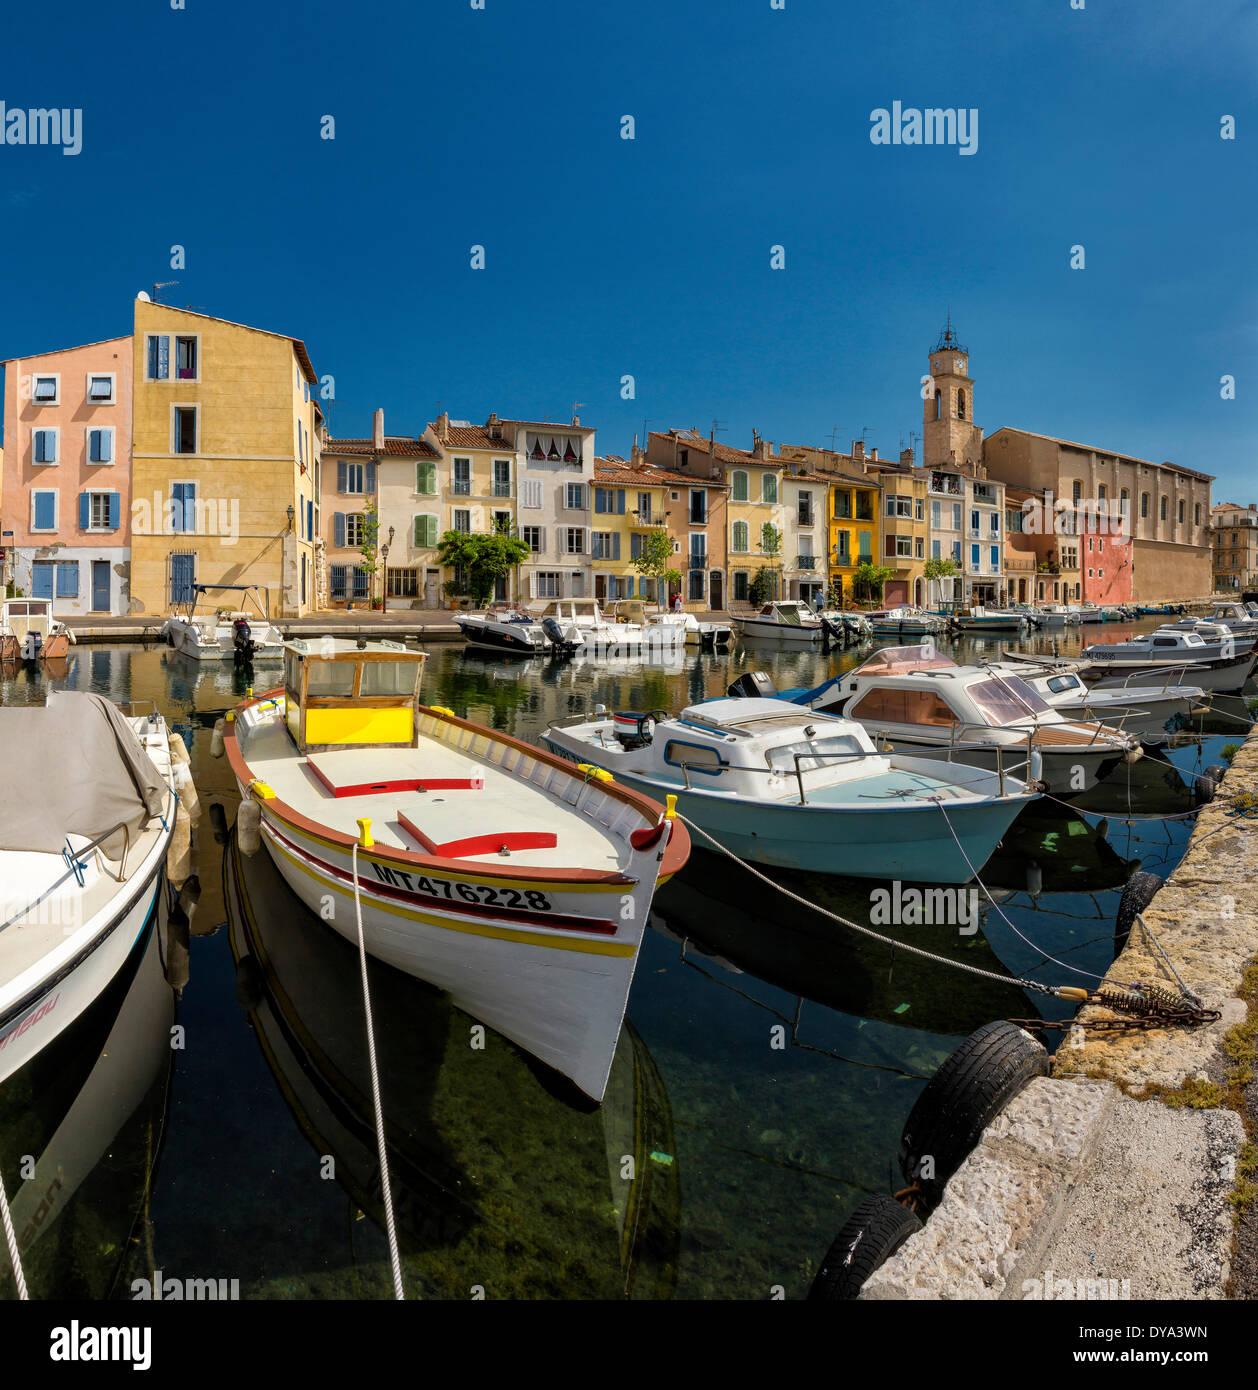 Quai Marceau, town, village, water, summer, ships, boat, Martique, Bouches du Rhone, France, Europe, - Stock Image